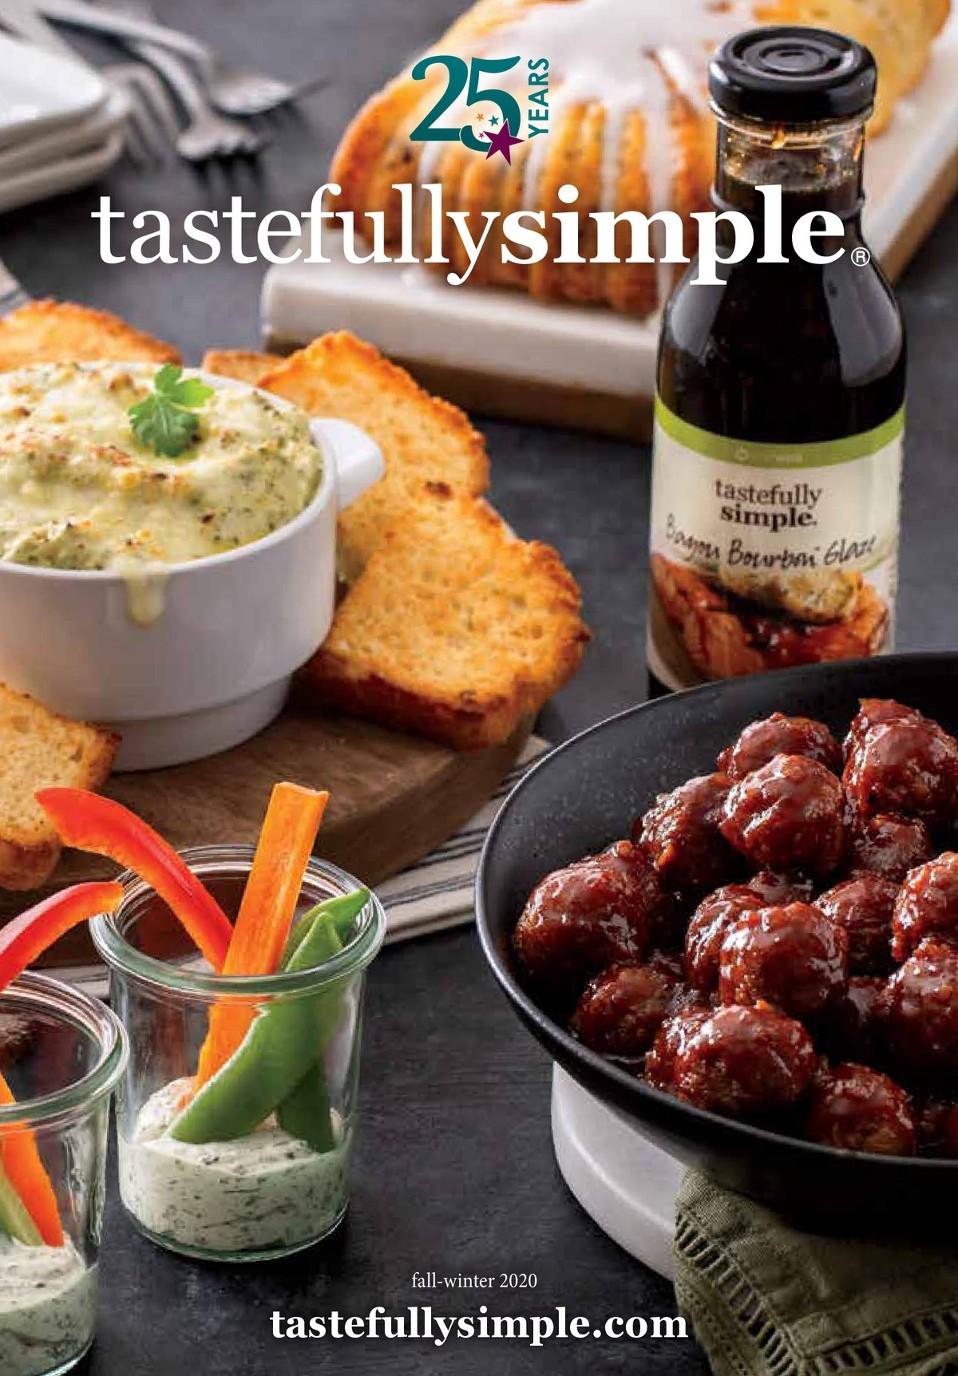 Tastefully Simple E-Catalog - Latest Lifestyle Food Catalog